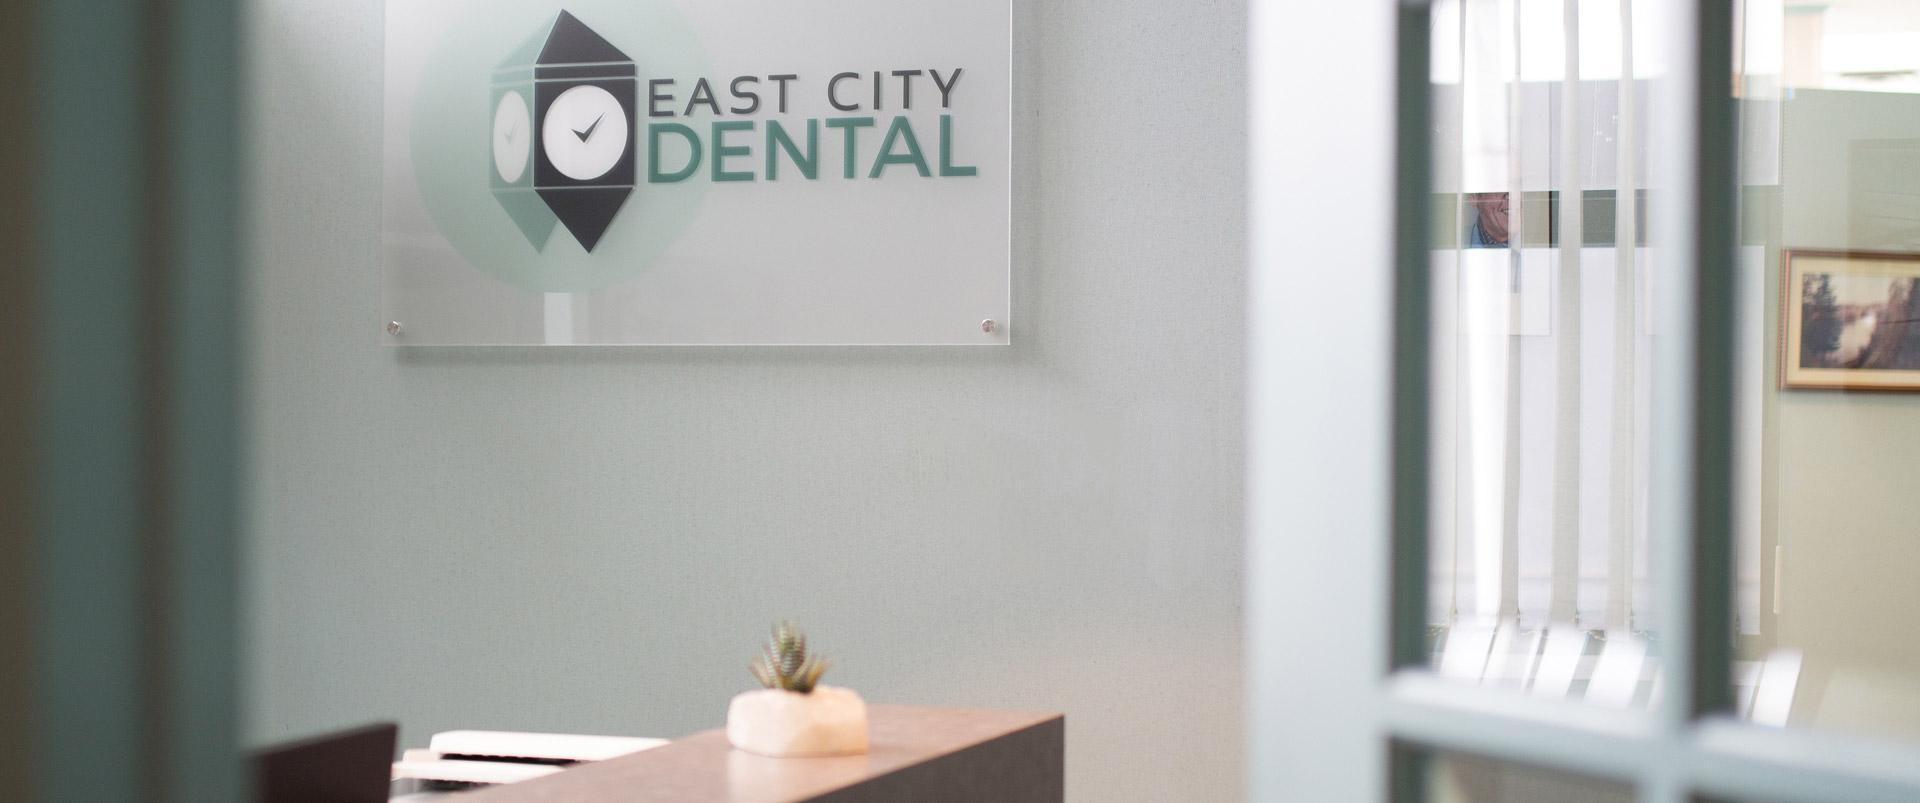 East City Dental - Peterborough Dentist